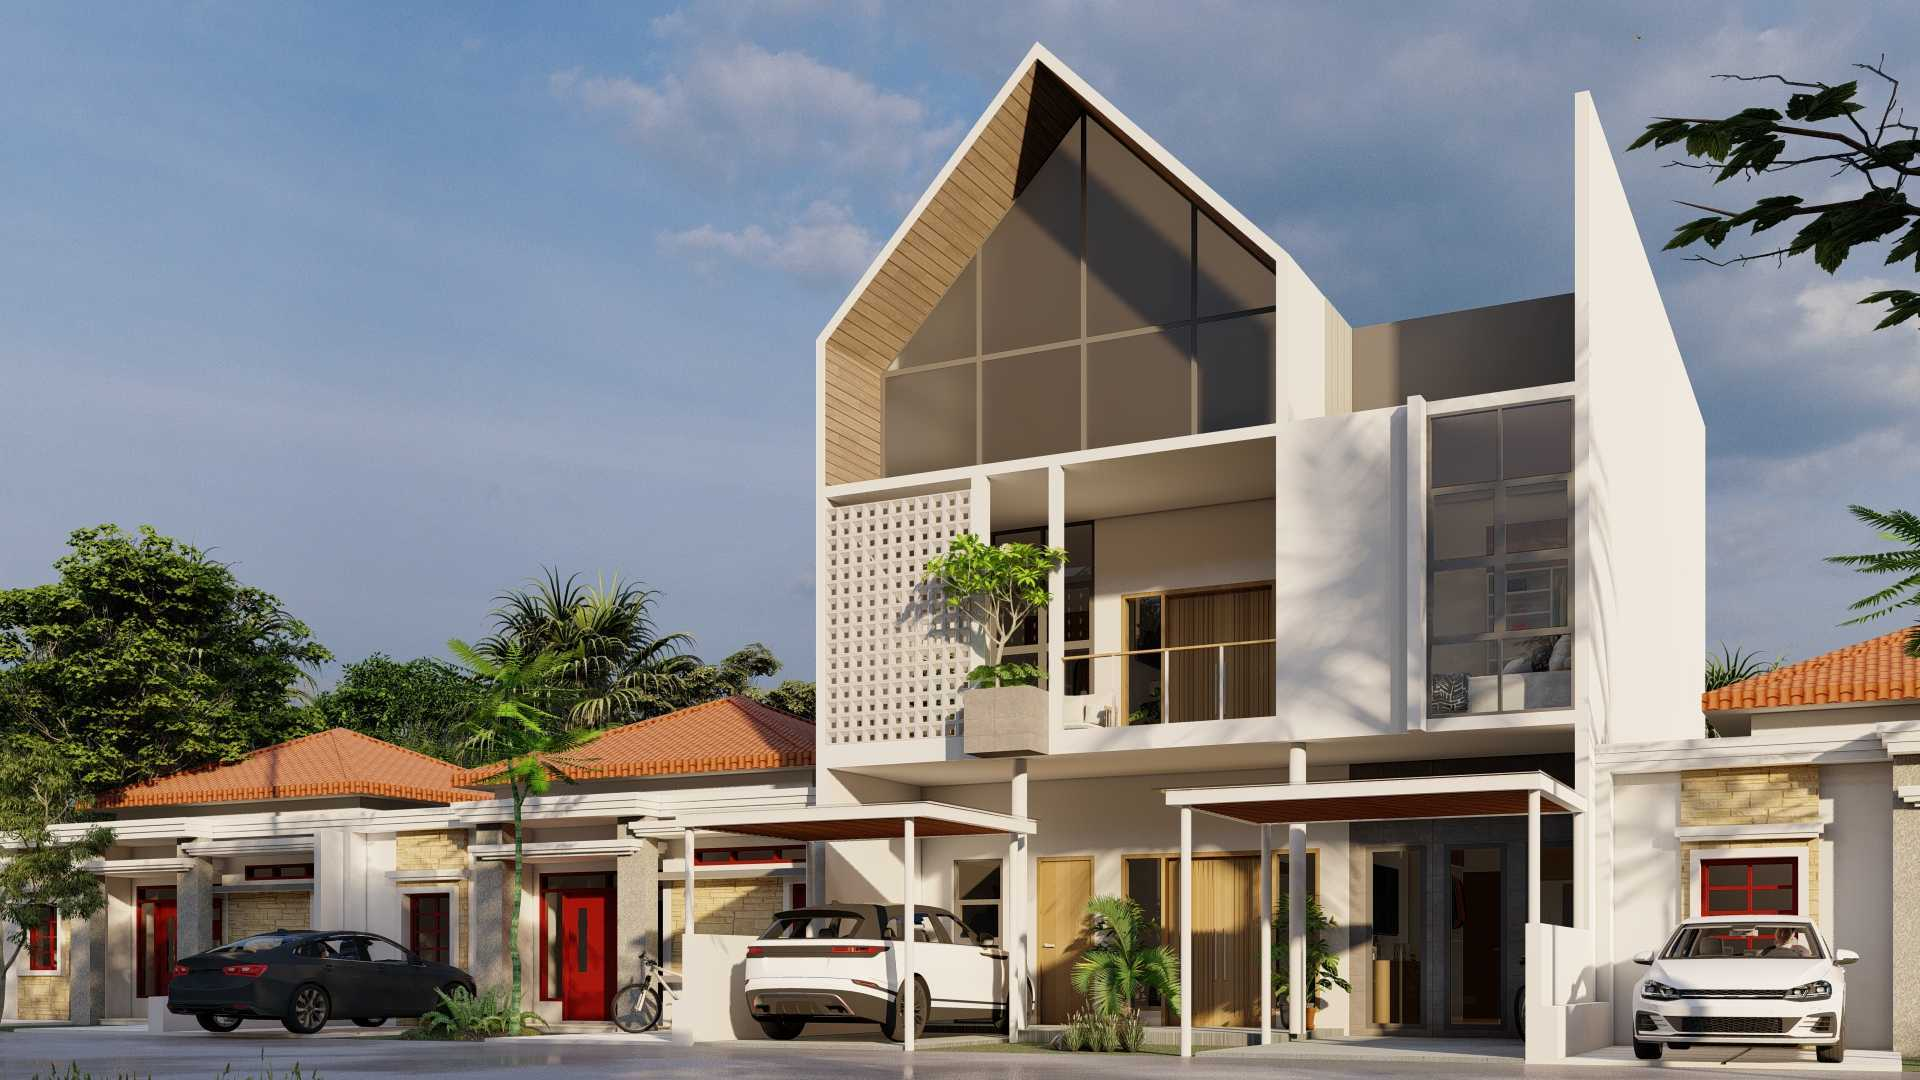 Havia Studio Sh House Bandung, Kota Bandung, Jawa Barat, Indonesia Bandung, Kota Bandung, Jawa Barat, Indonesia Havia-Studio-Sh-House  128463